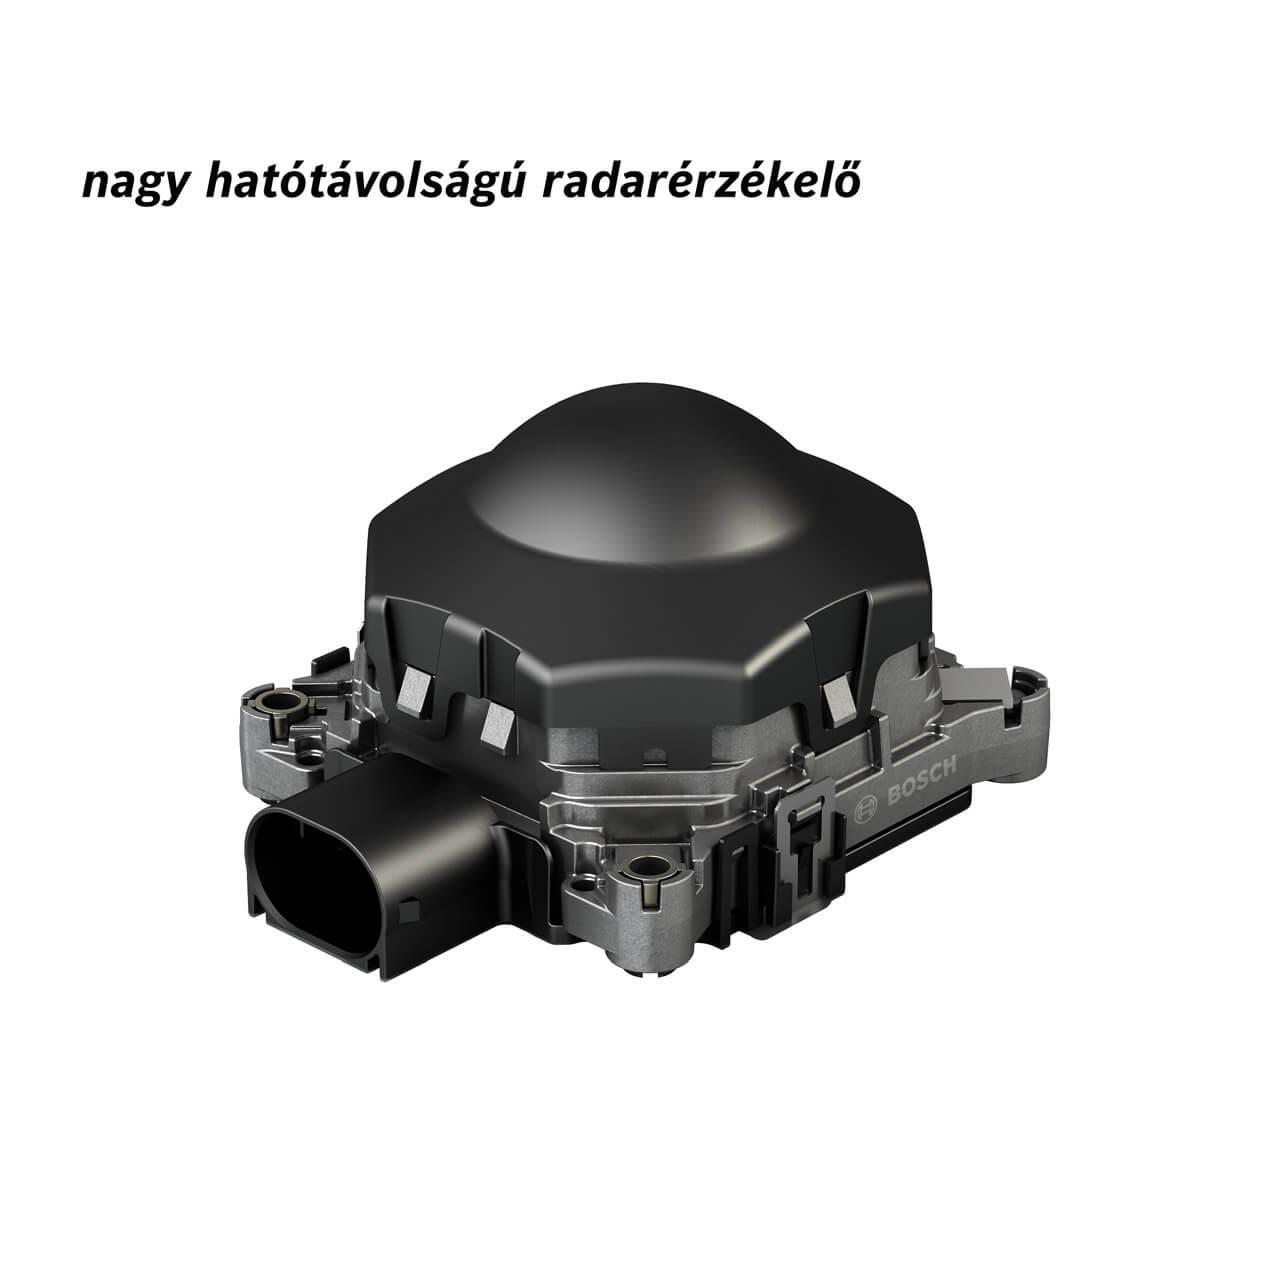 A Maserati Ghibli legfontosabb Bosch termékei